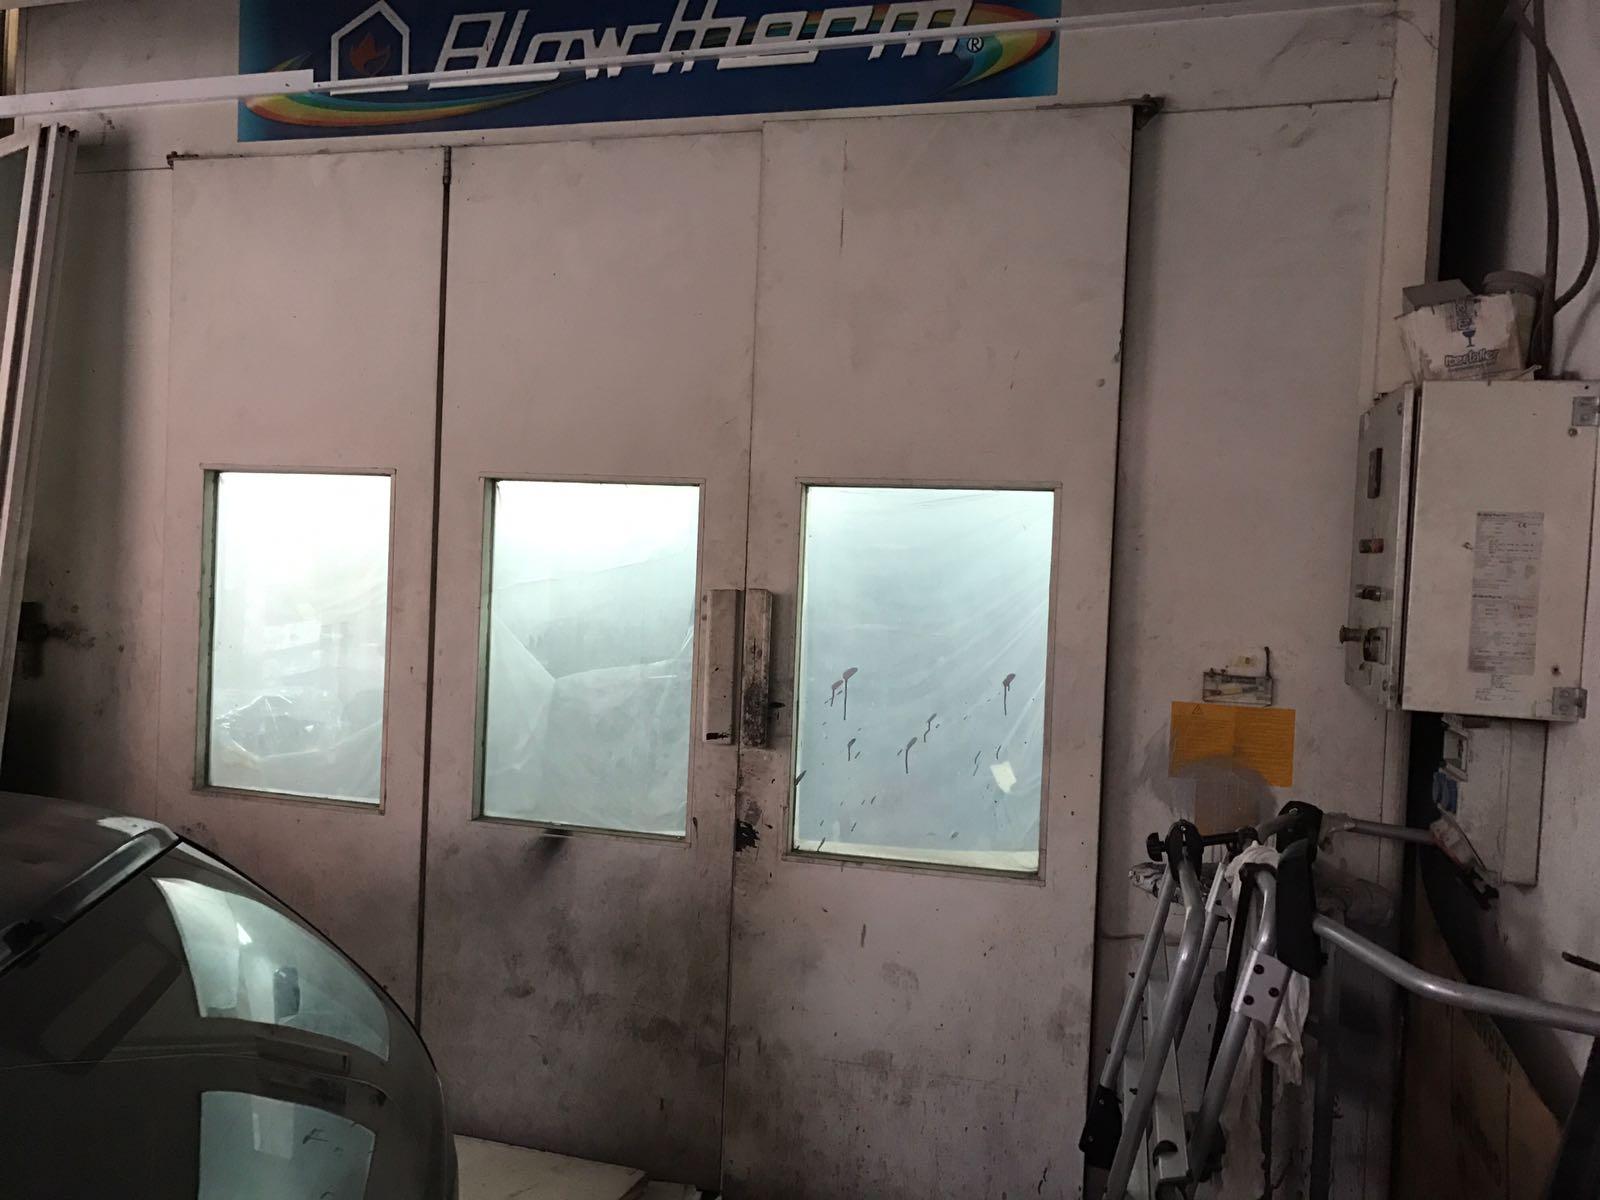 Cabine de peinture blowtherm estra machines d 39 occasion exapro - Cabina pintura ocasion ...